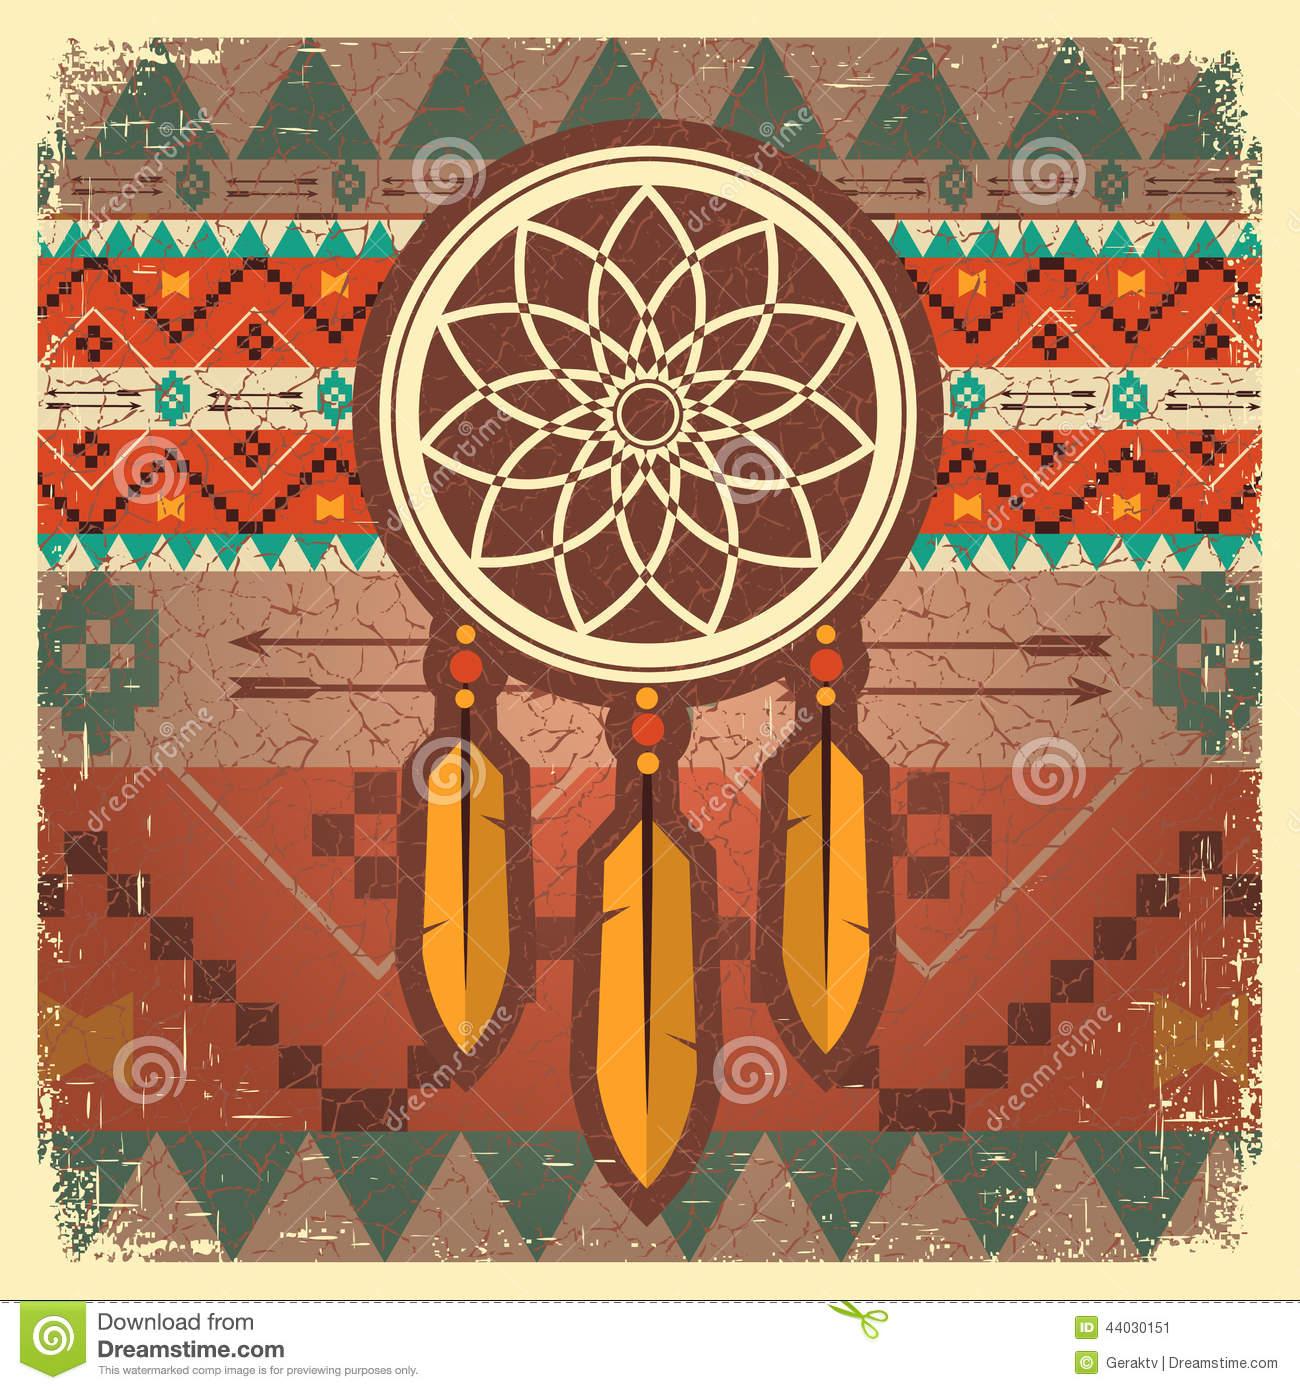 Poster clipart native More!  ethnic native ornament